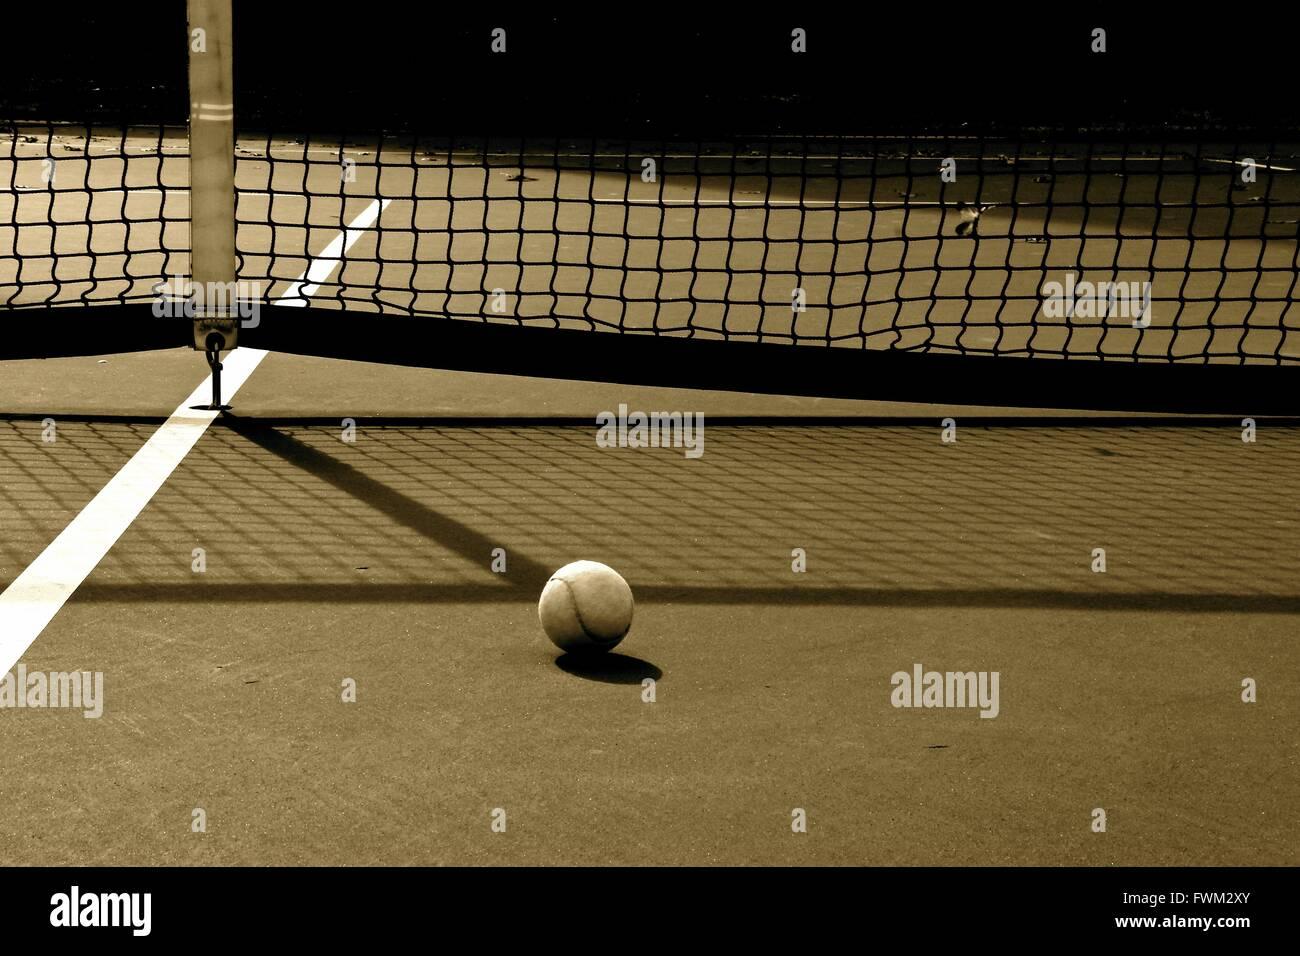 Pelota de Tenis contra la Net en la corte Imagen De Stock